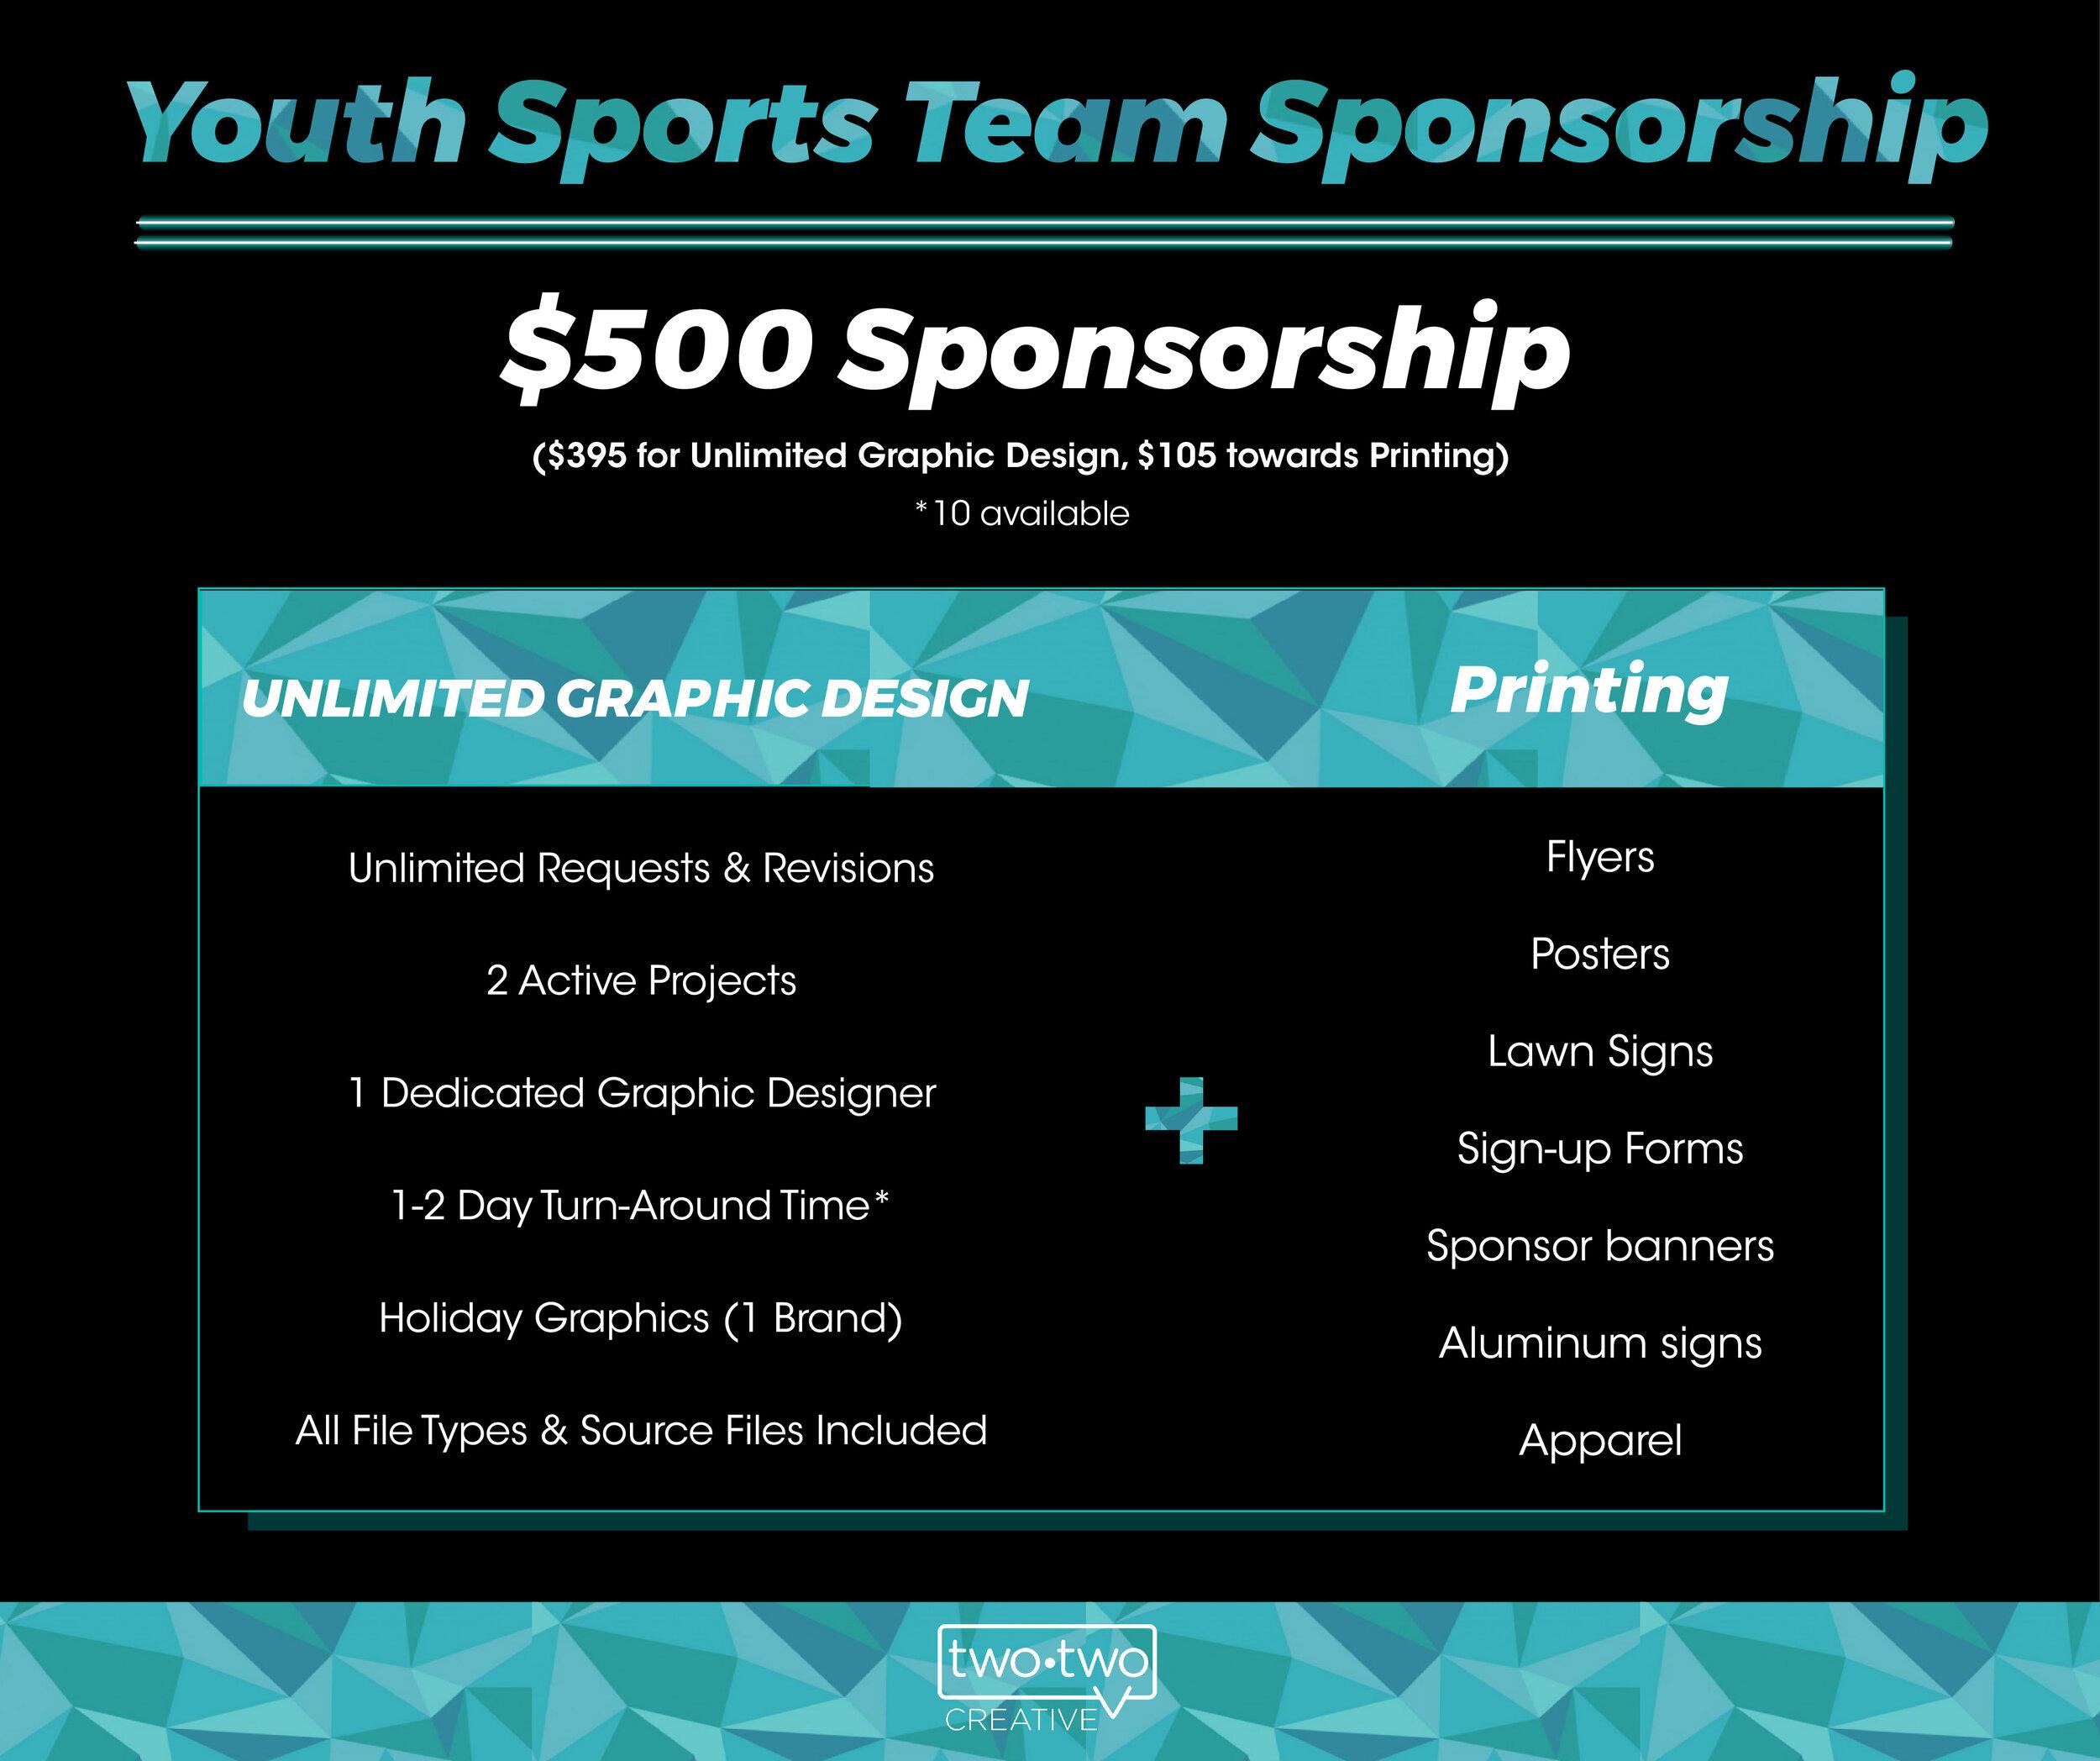 Youth_Sports_Team_Sponsorship_940_x_788.jpg